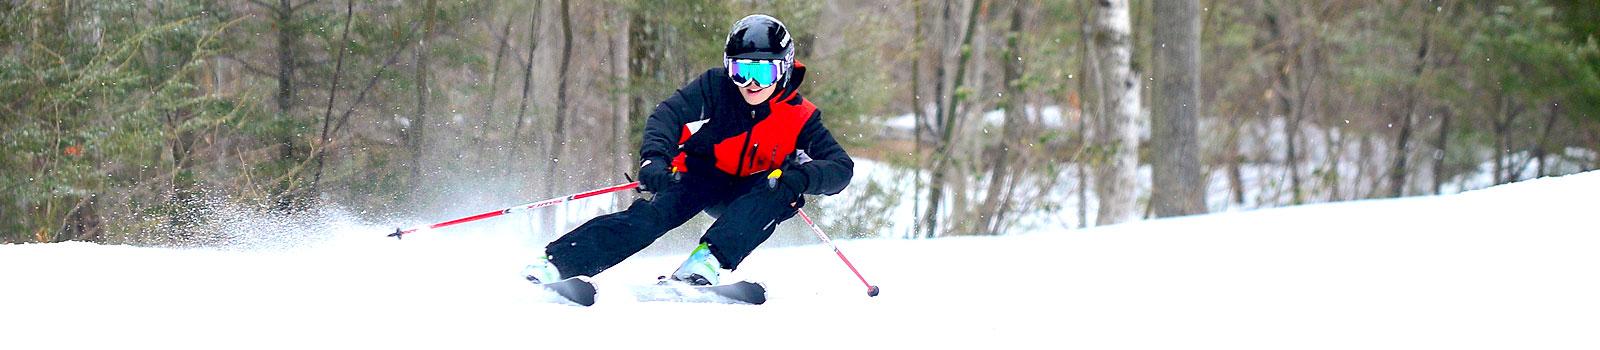 demo skis mammoth